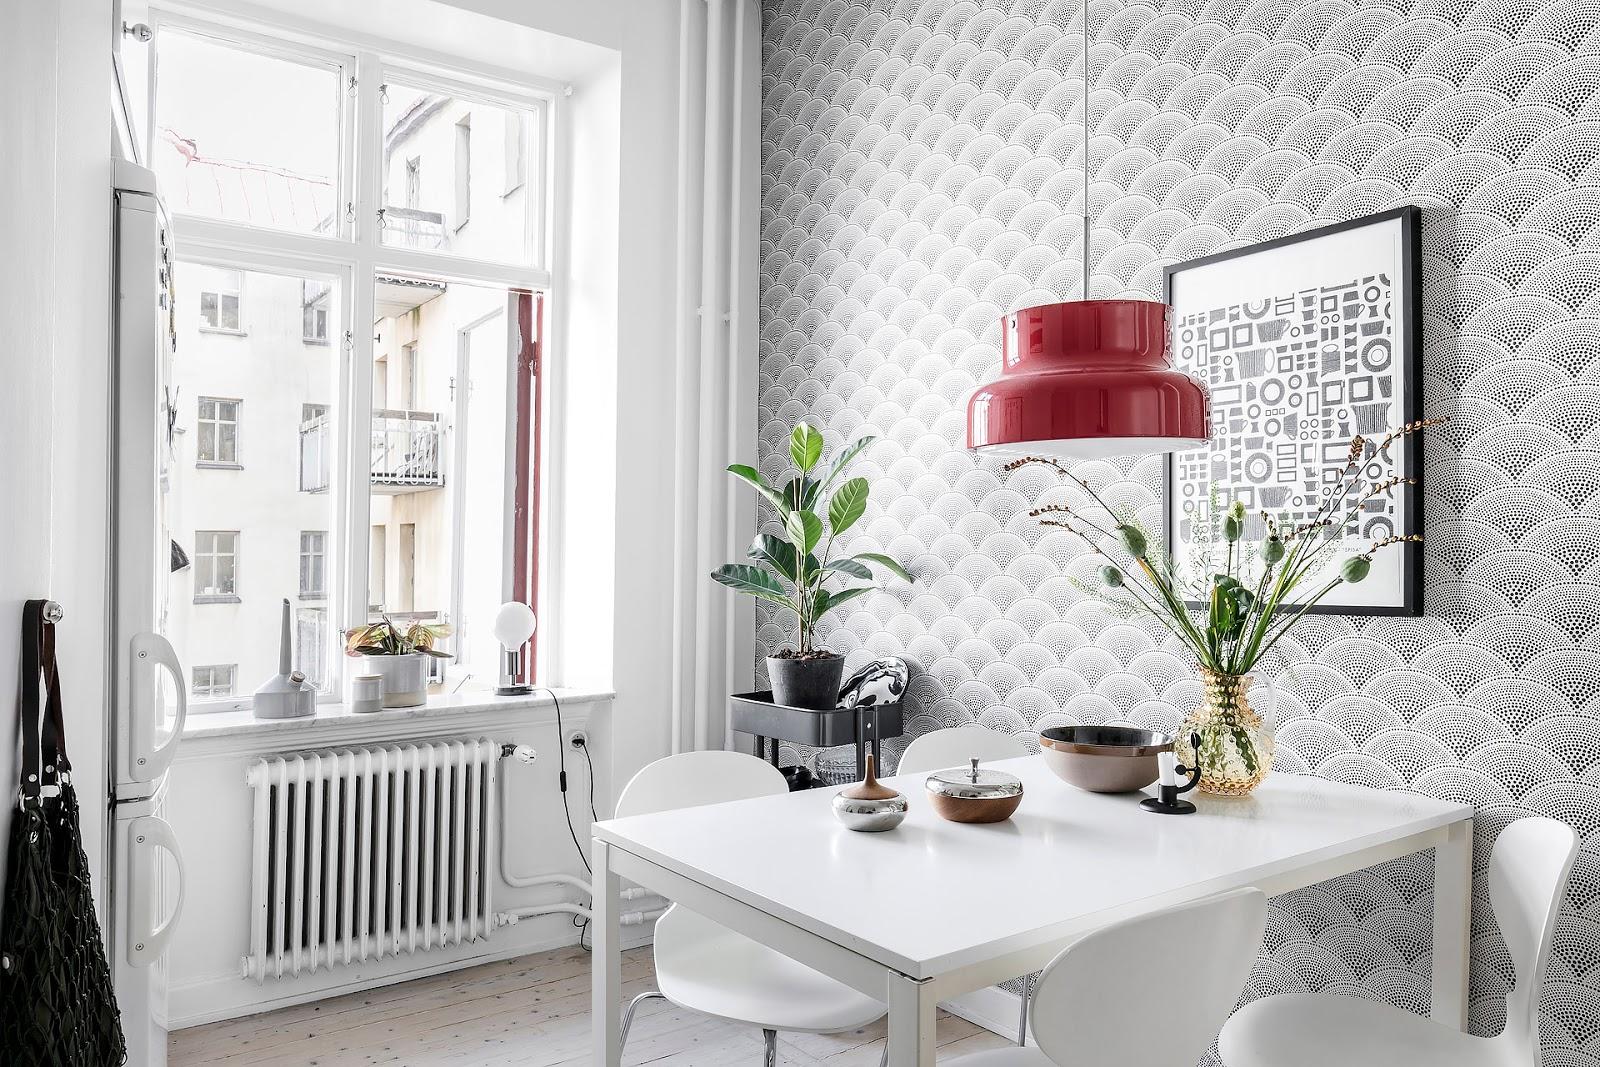 White kitchen design inside of a small scandinavian interior, pattern wallpaper, red retro lamp